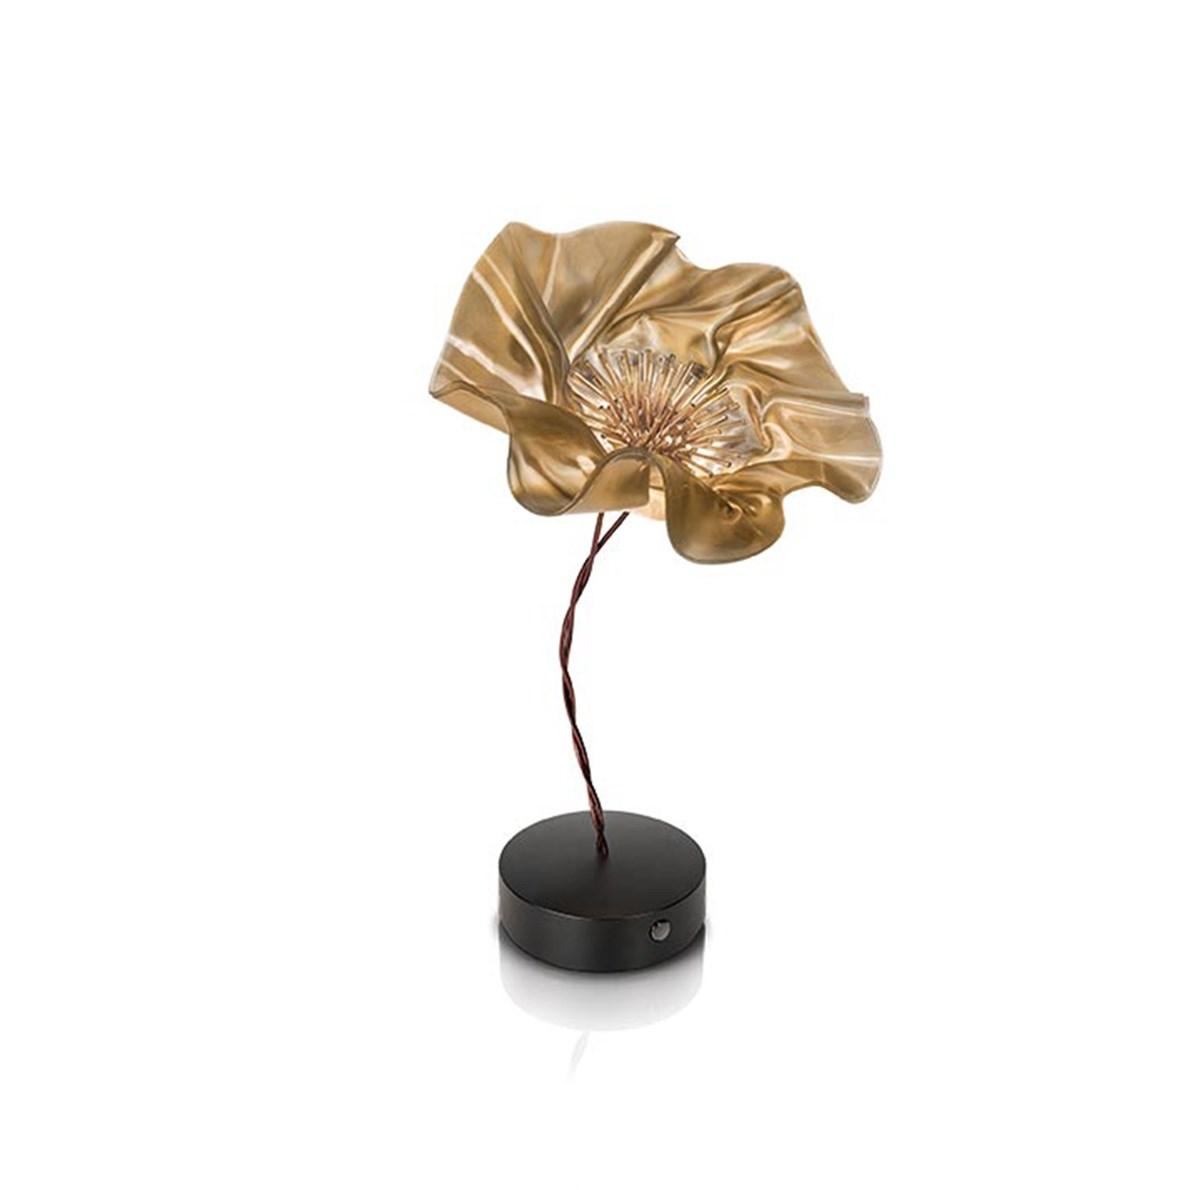 Slamp-Adriano-Rachele-Lafleur-Table-Lamp-Battery-Powered-Matisse-1